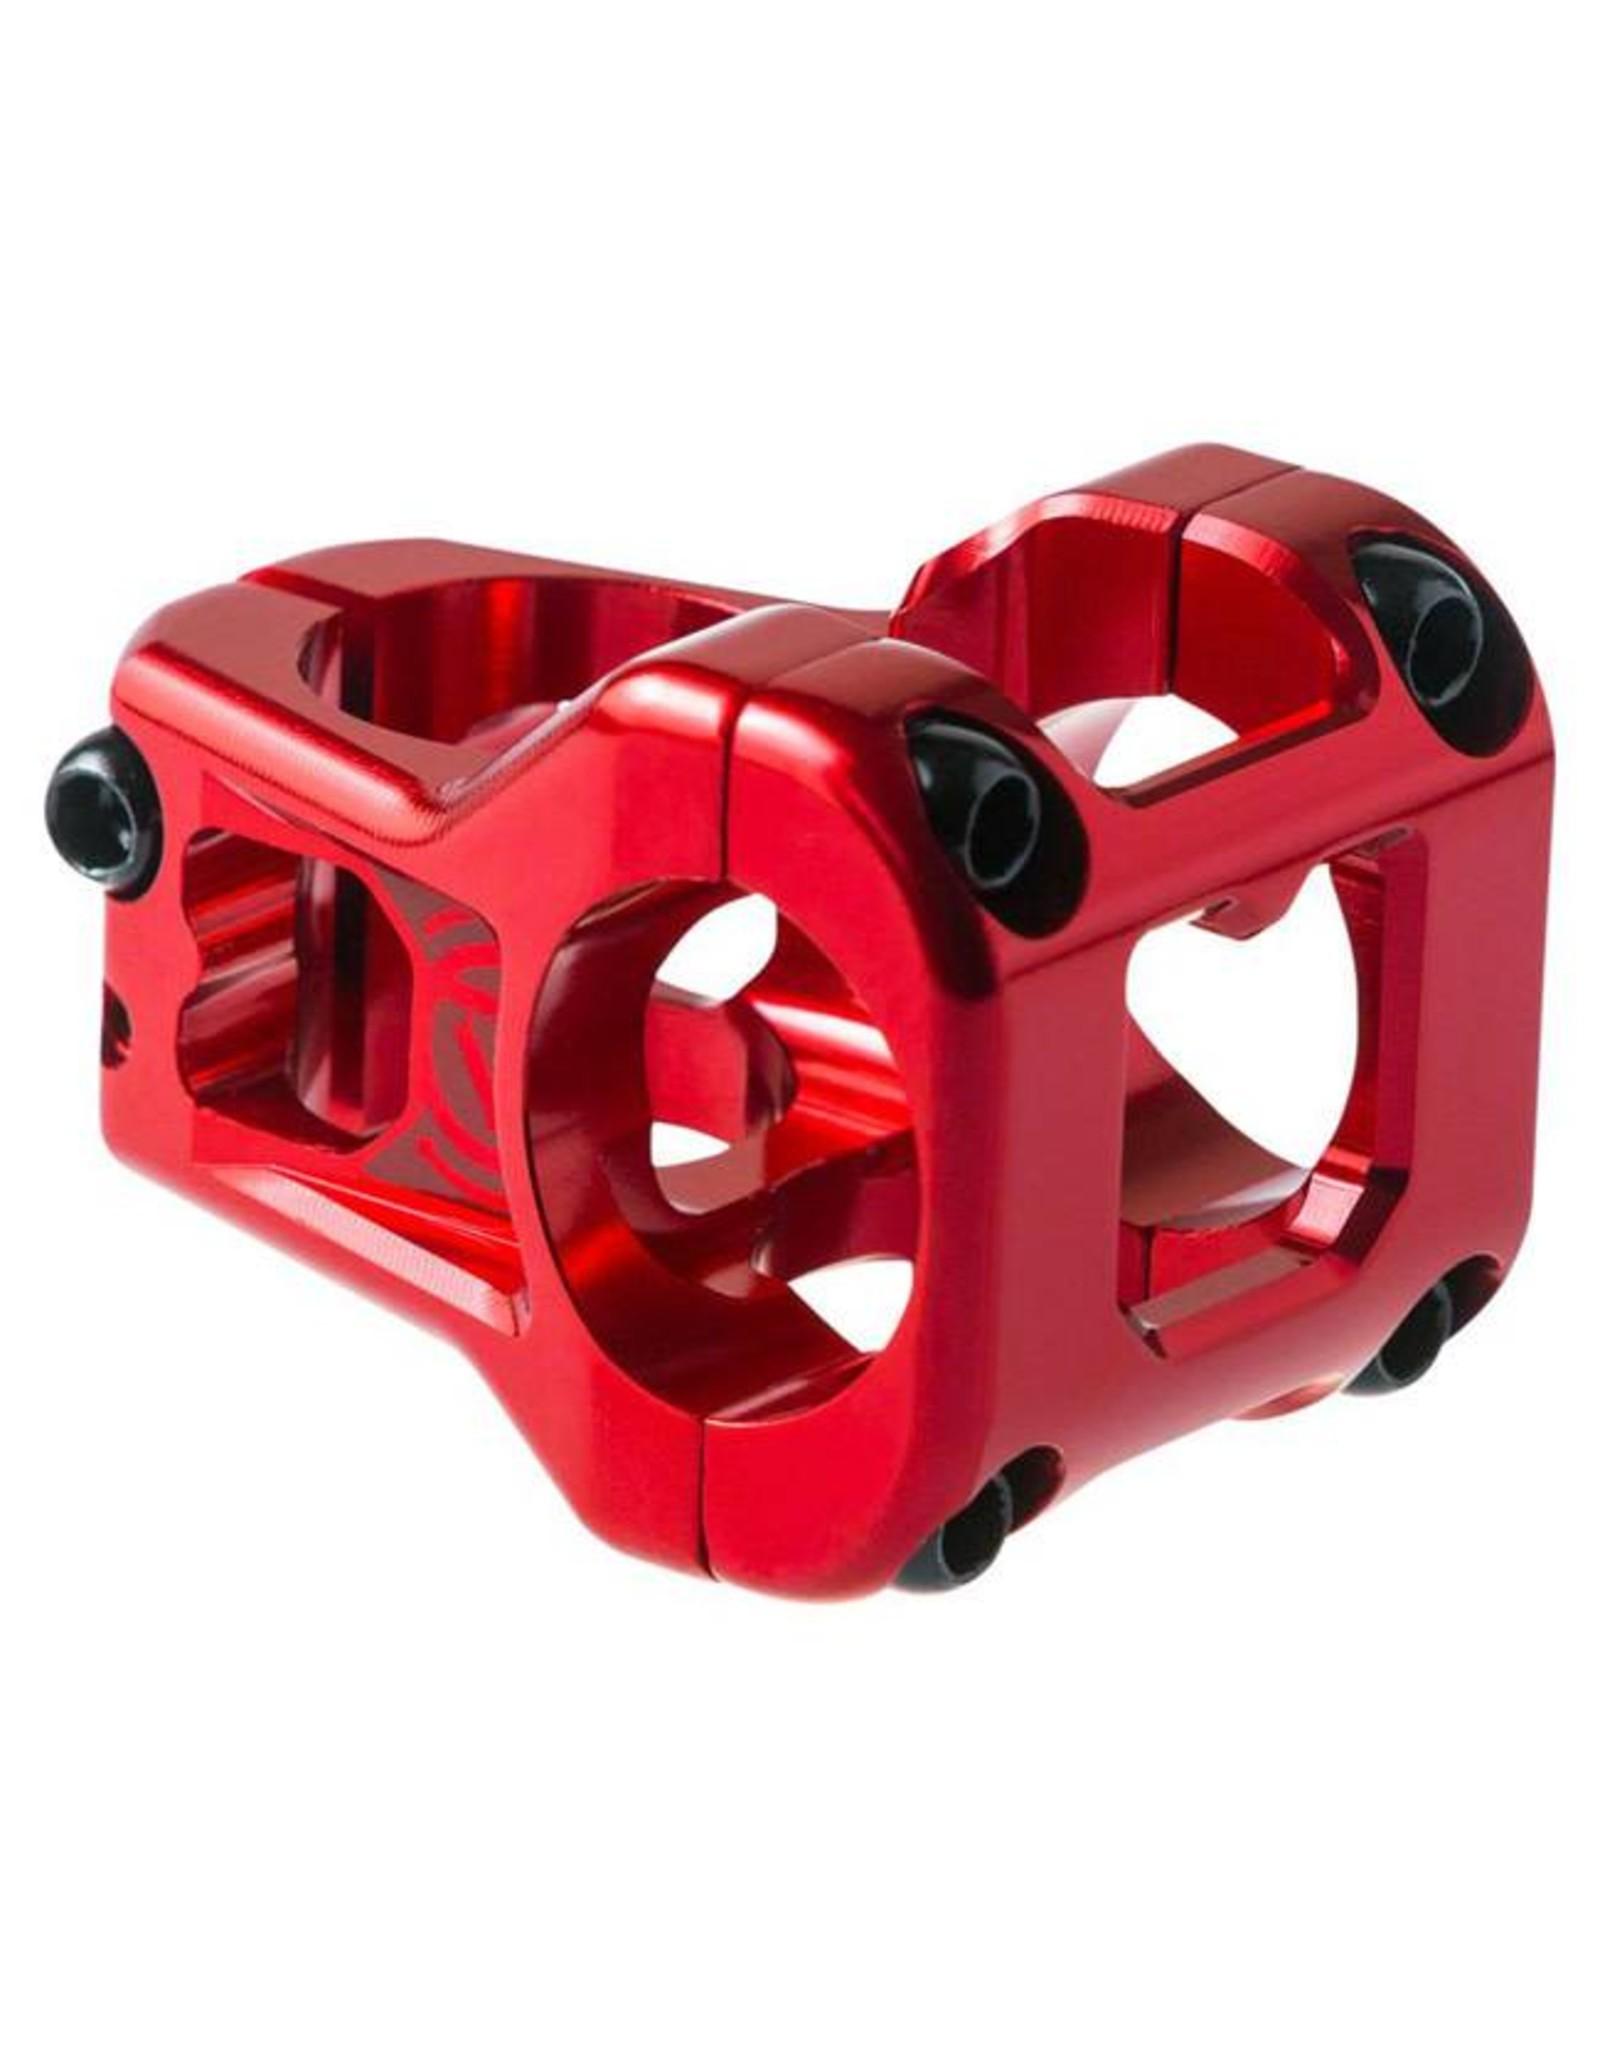 Deity Components Deity Cavity Stem: 35mm, 31.8 Clamp, Red